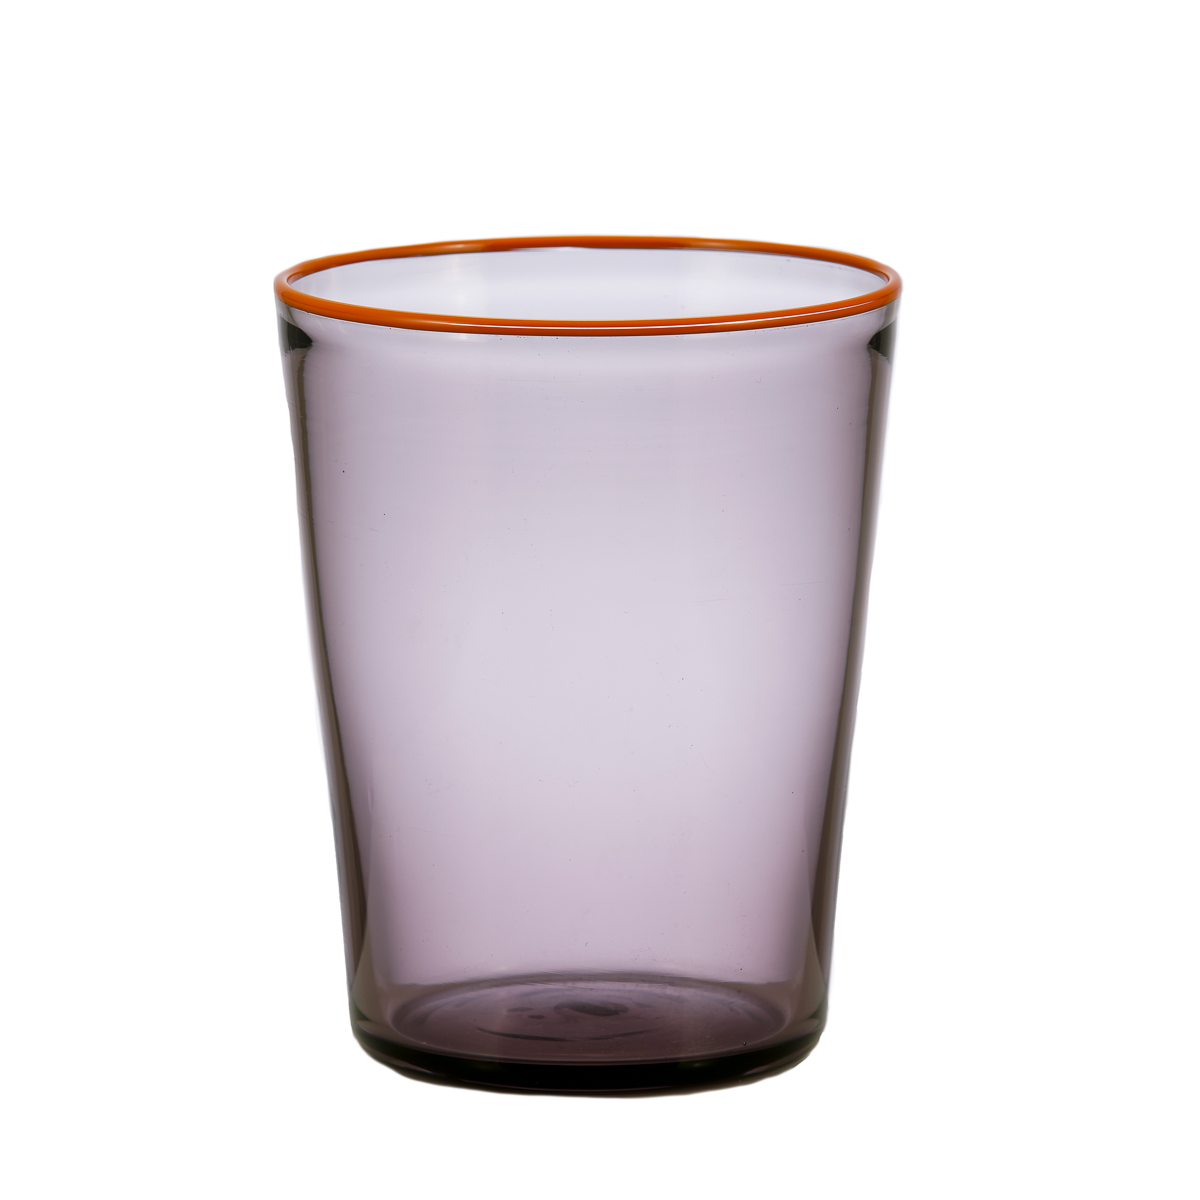 vaso-glass-giberto-colorful-spring-estelita-season-venice-design-luxury